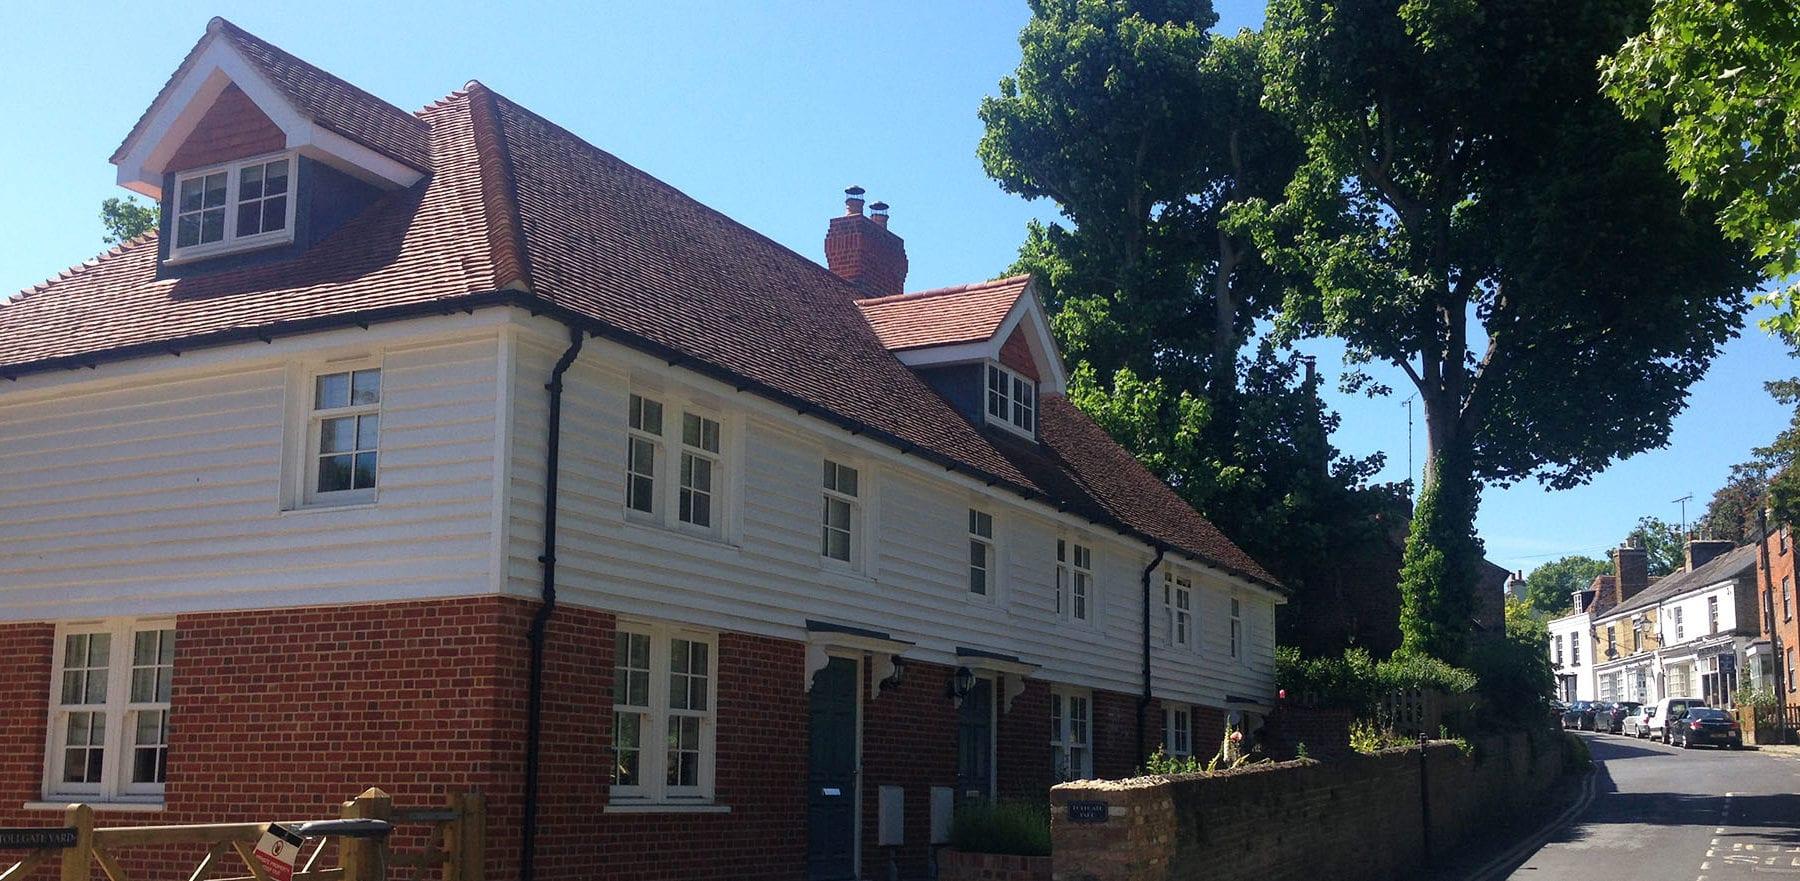 Lifestiles - Handcrafted Orange Clay Roof Tiles - Farningham, England 2